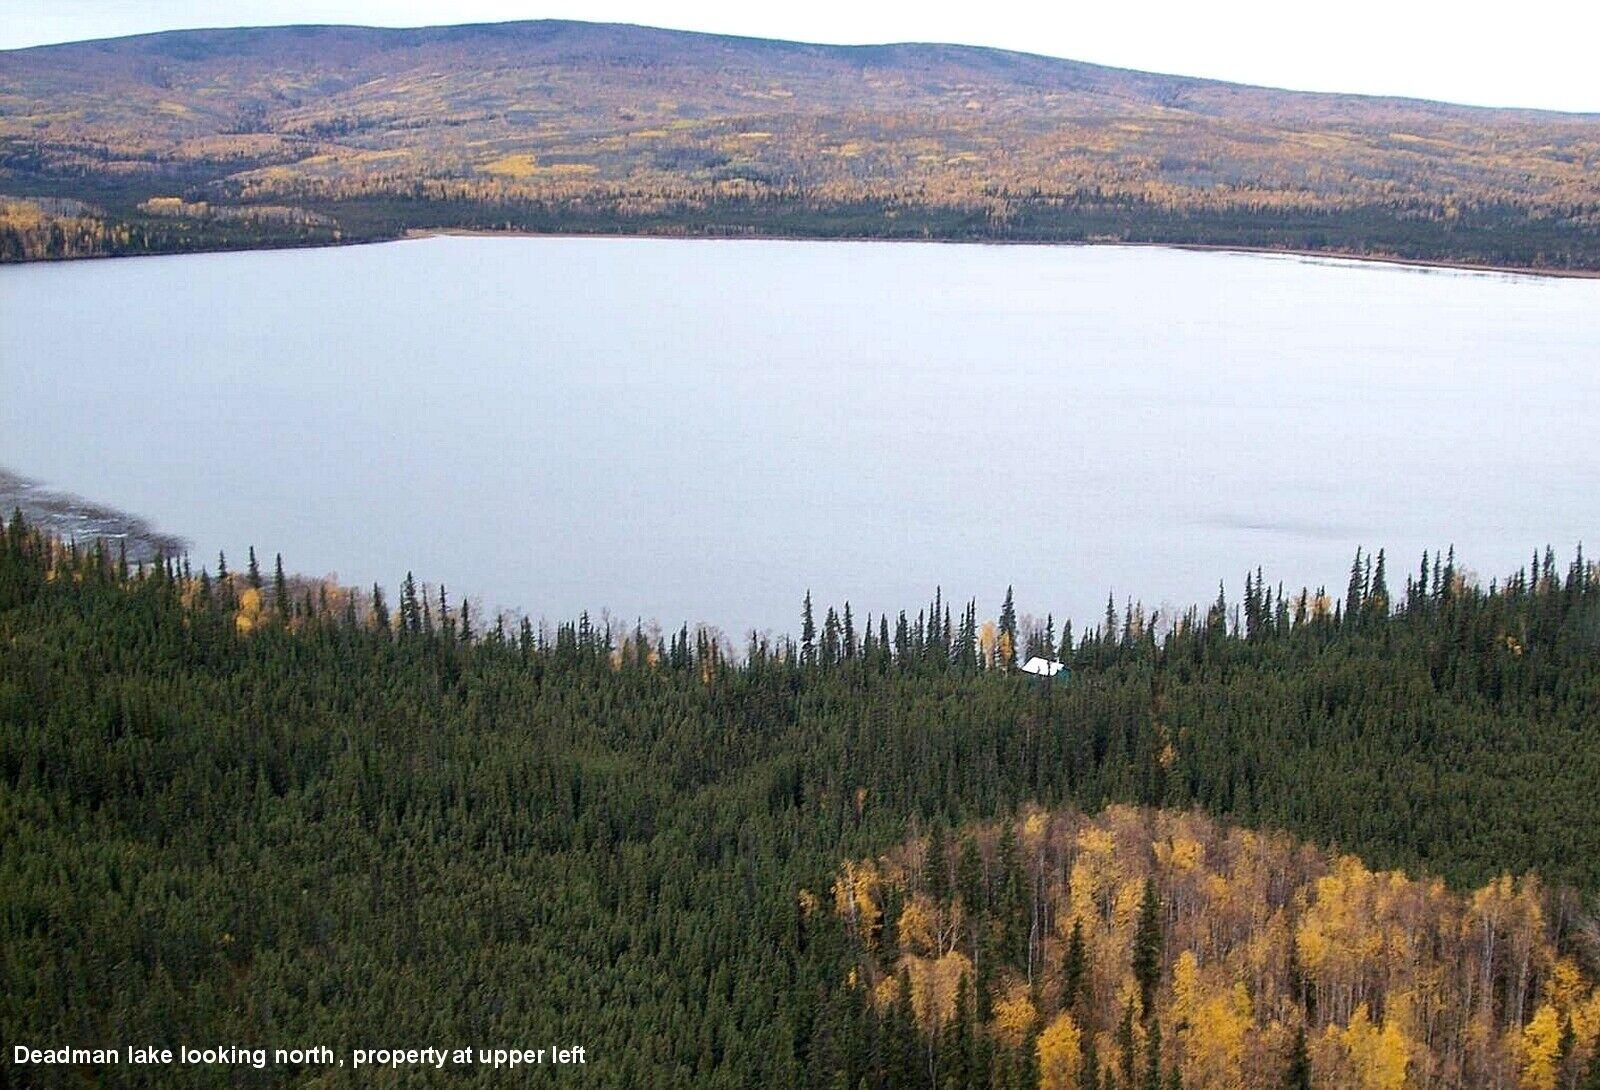 4.64 ACRES ALASKA LAKE LAND - CABIN, HOMESTEAD, HUNT, FISH, CAMP - EZ FINANCING!